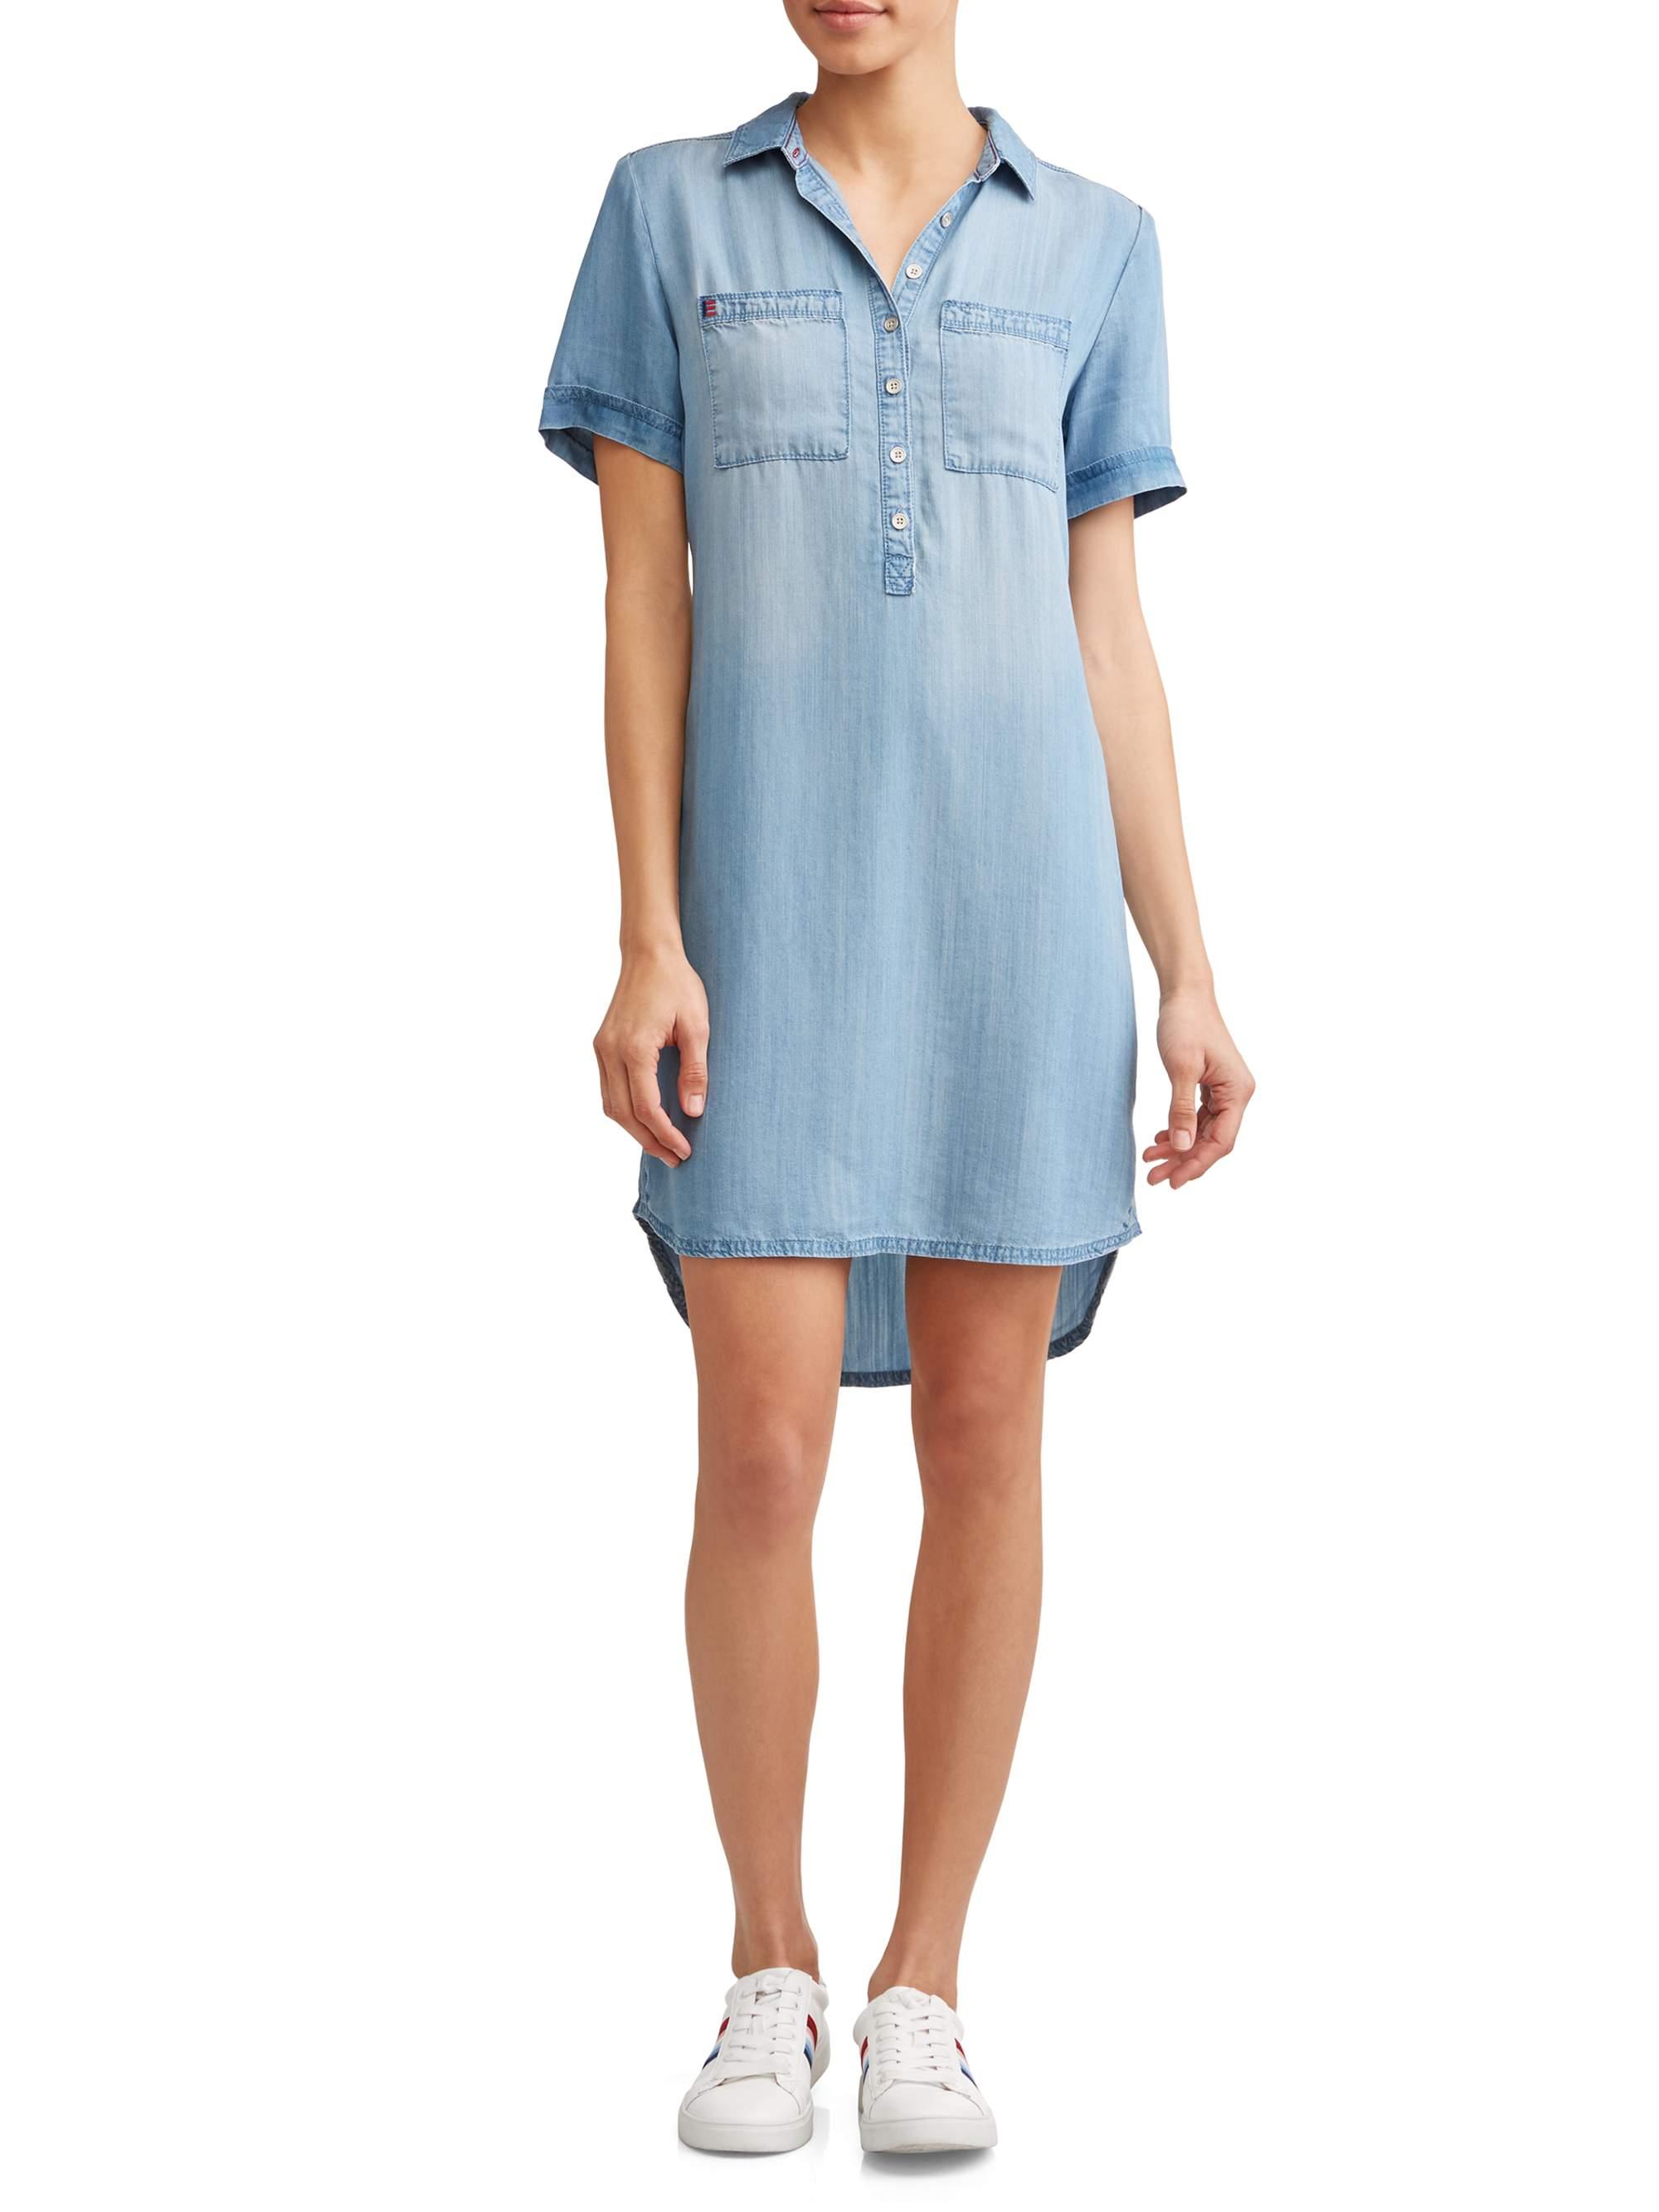 Chambray 2-Pocket Short Sleeve Dress Women's